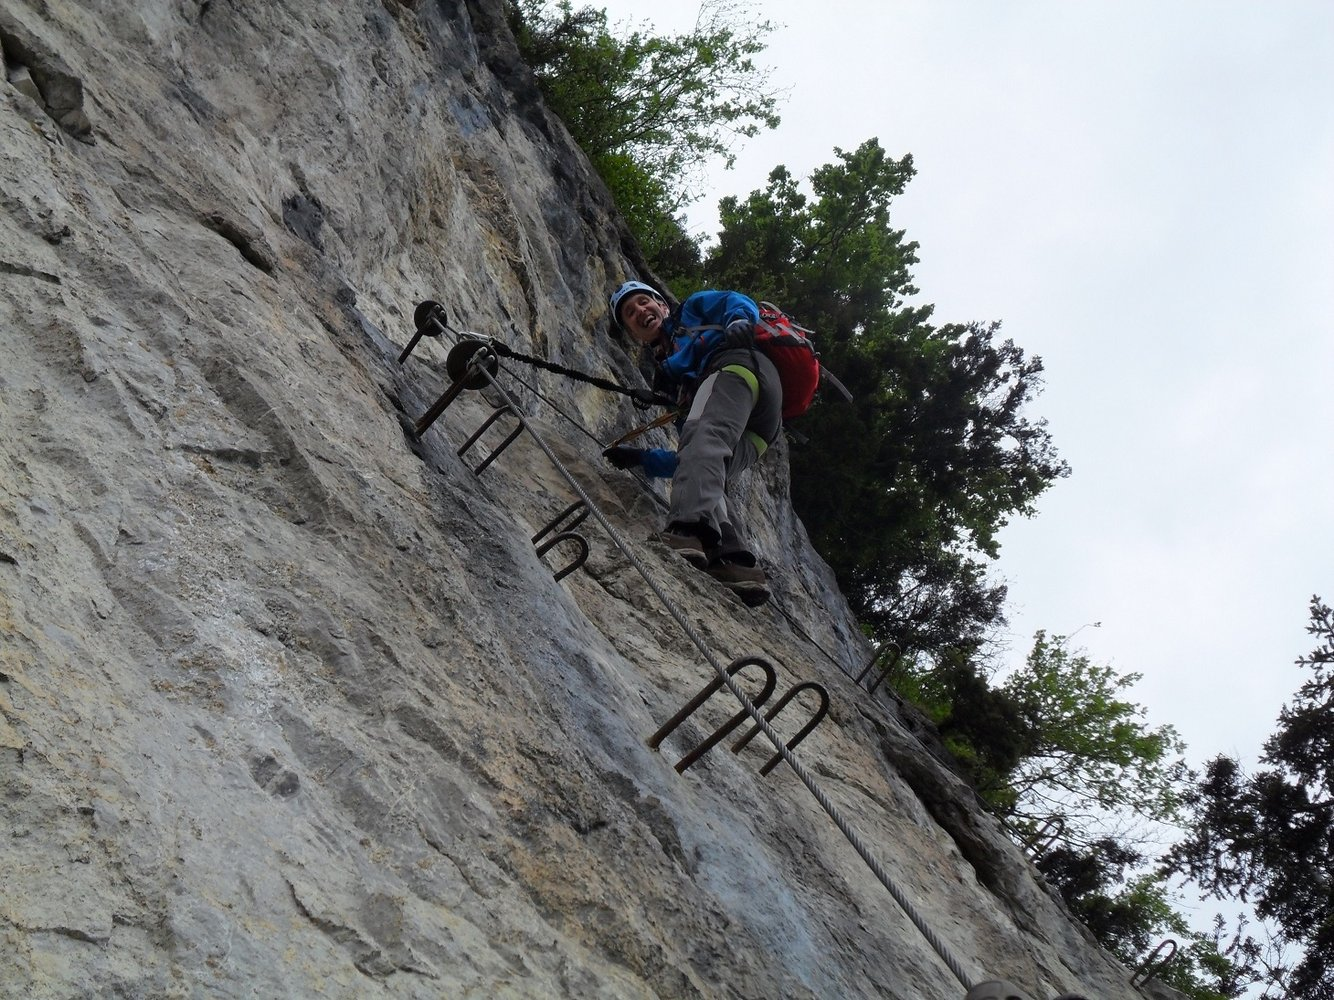 Via Kessi Klettersteig : Via kessi klettersteig bergsteigen